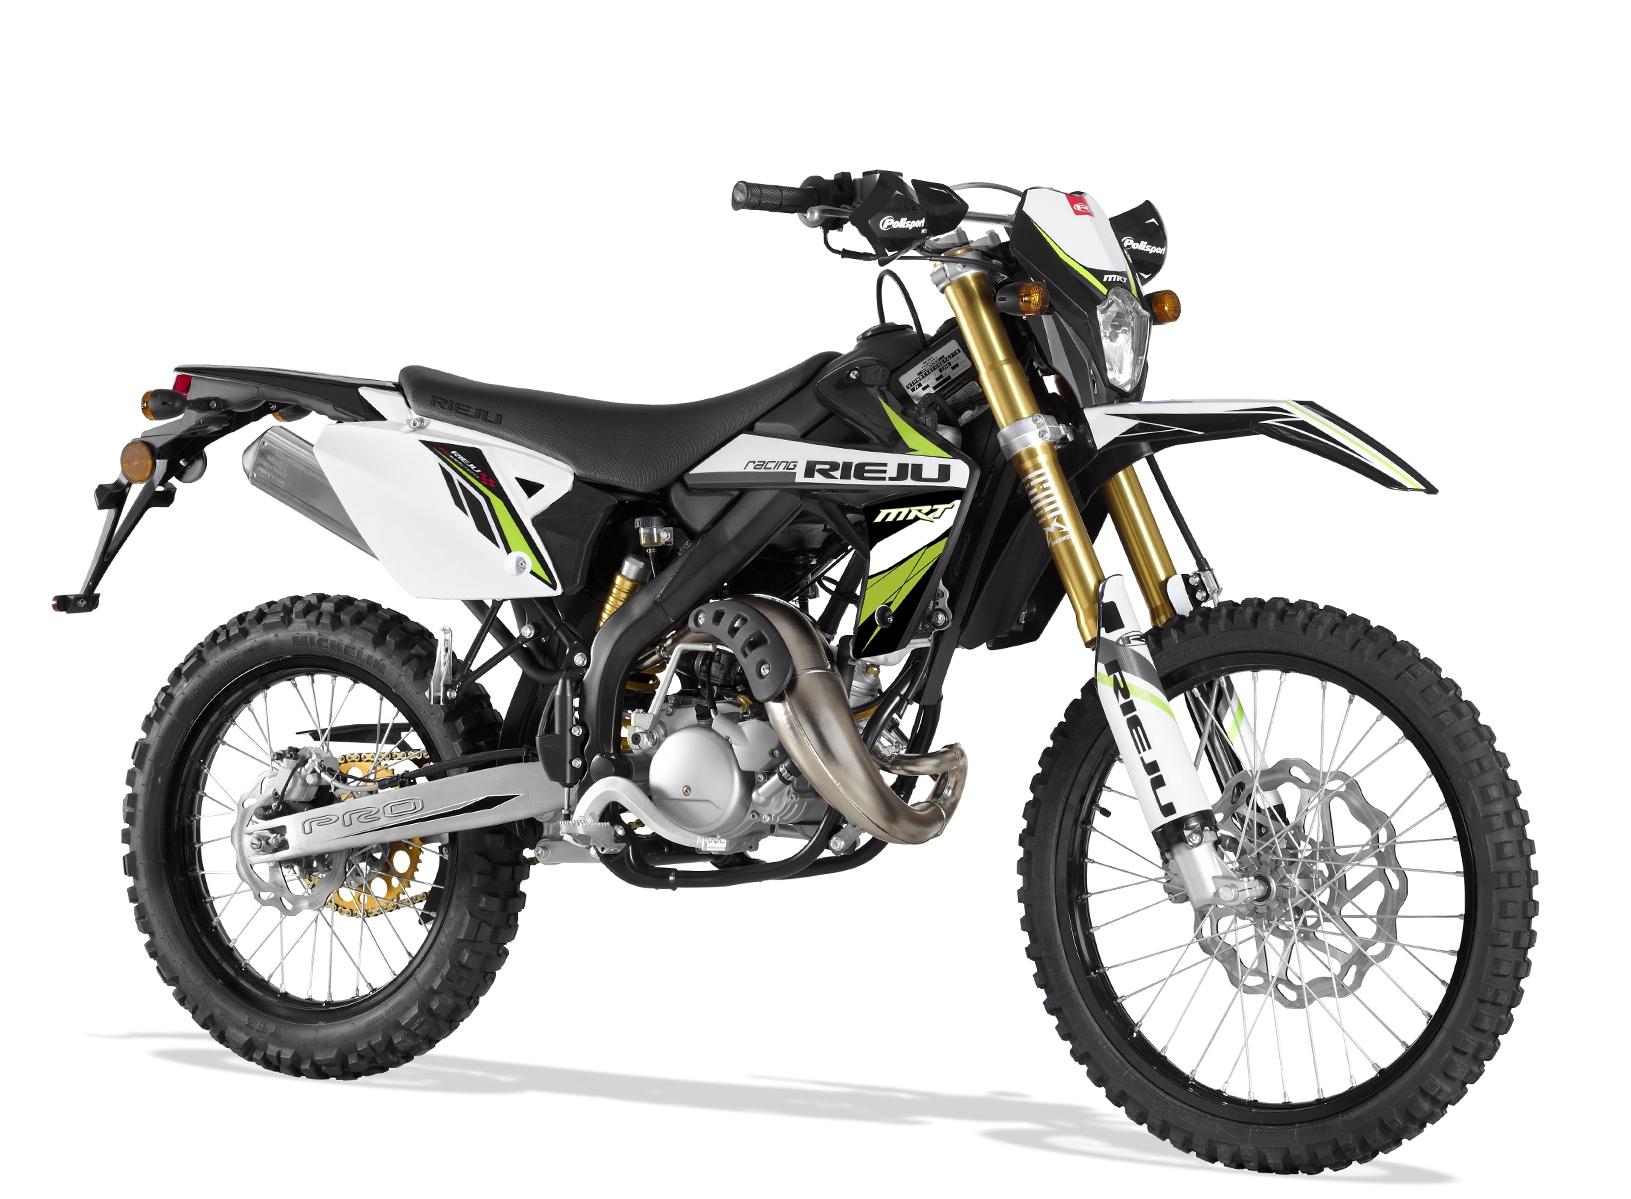 2013 rieju mrt 50 pro the diminutive motocross machine autoevolution